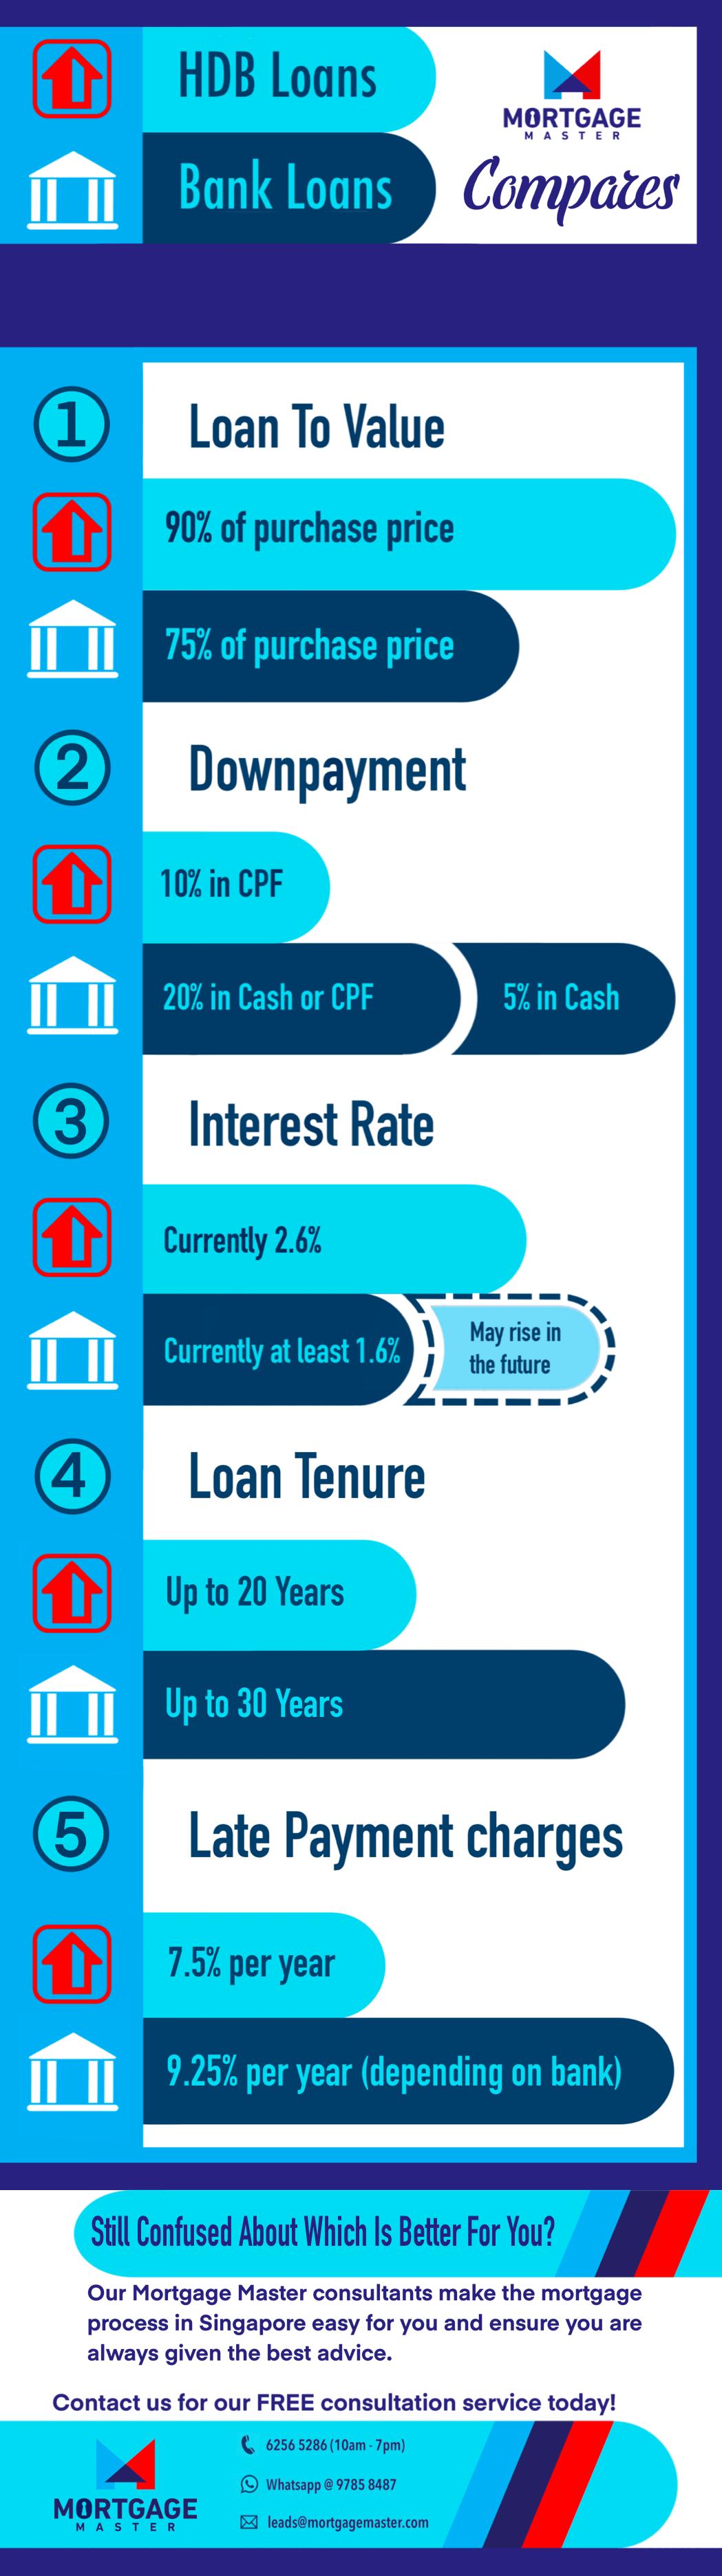 HDB Loan vs Bank Loan Infographic